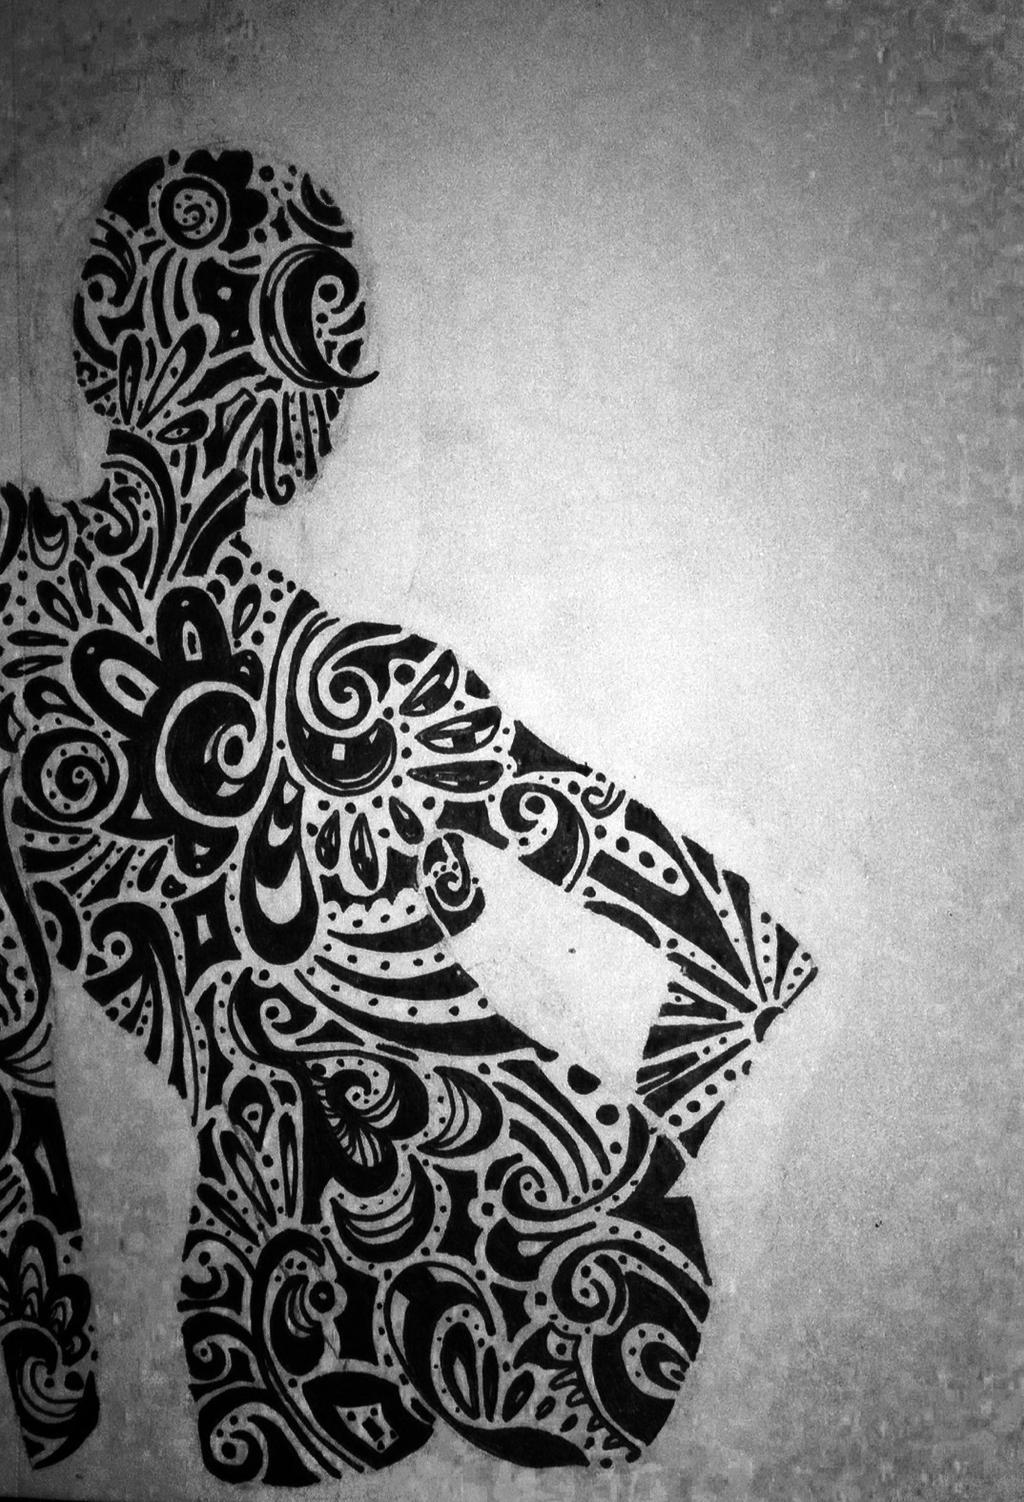 Swirls by phantomonex